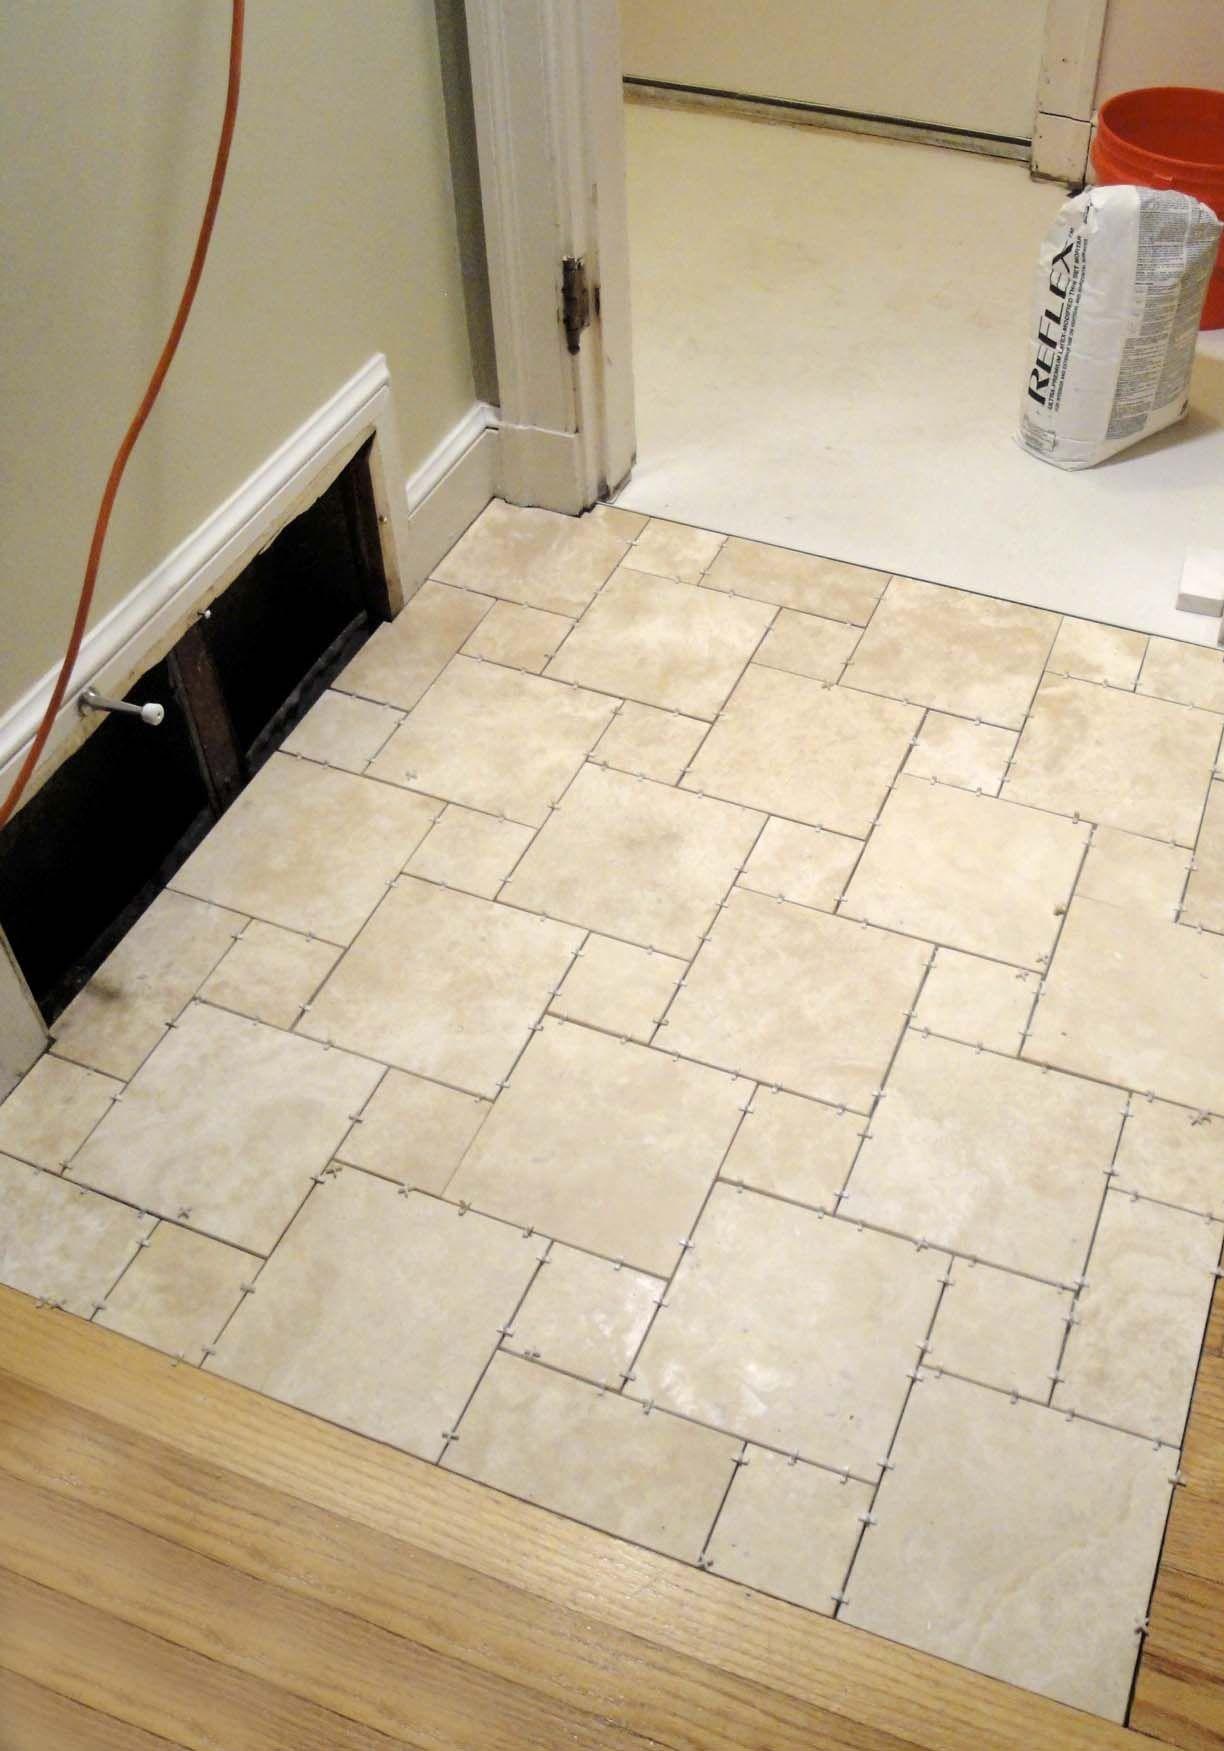 Best Kitchen Gallery: Enjoyable Travertine White Porcelain Bathroom Floor Tile Ideas As of Bathroom Floor Tile Pattern Ideas on rachelxblog.com